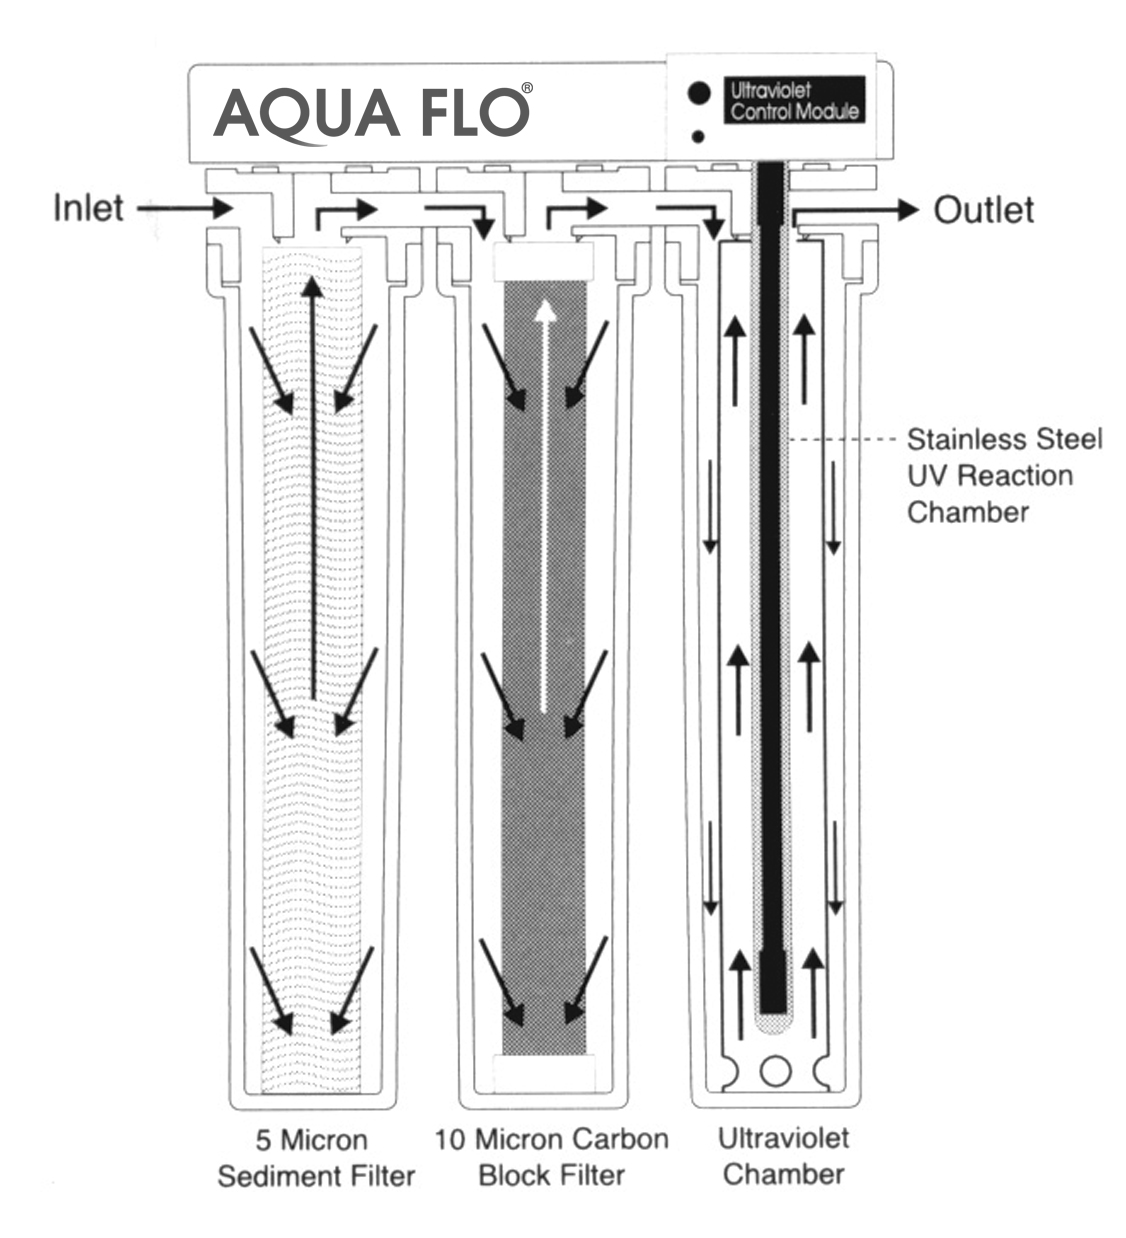 Aqua Flo_UV_Cutaway2.jpg